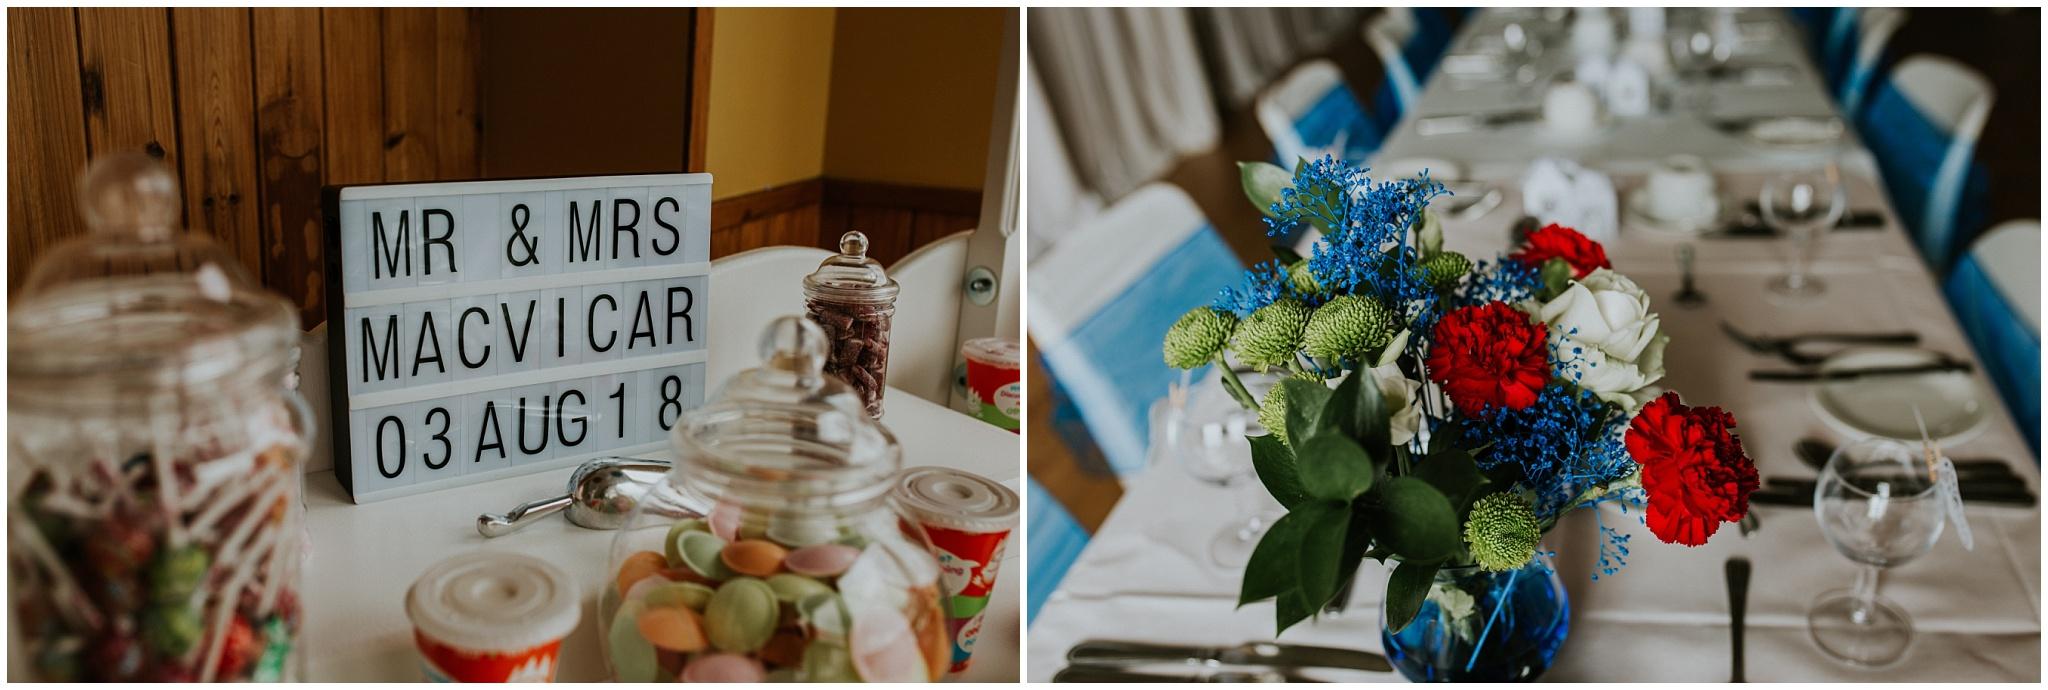 Carnish Hall Wedding, North Uist Wedding candy cart